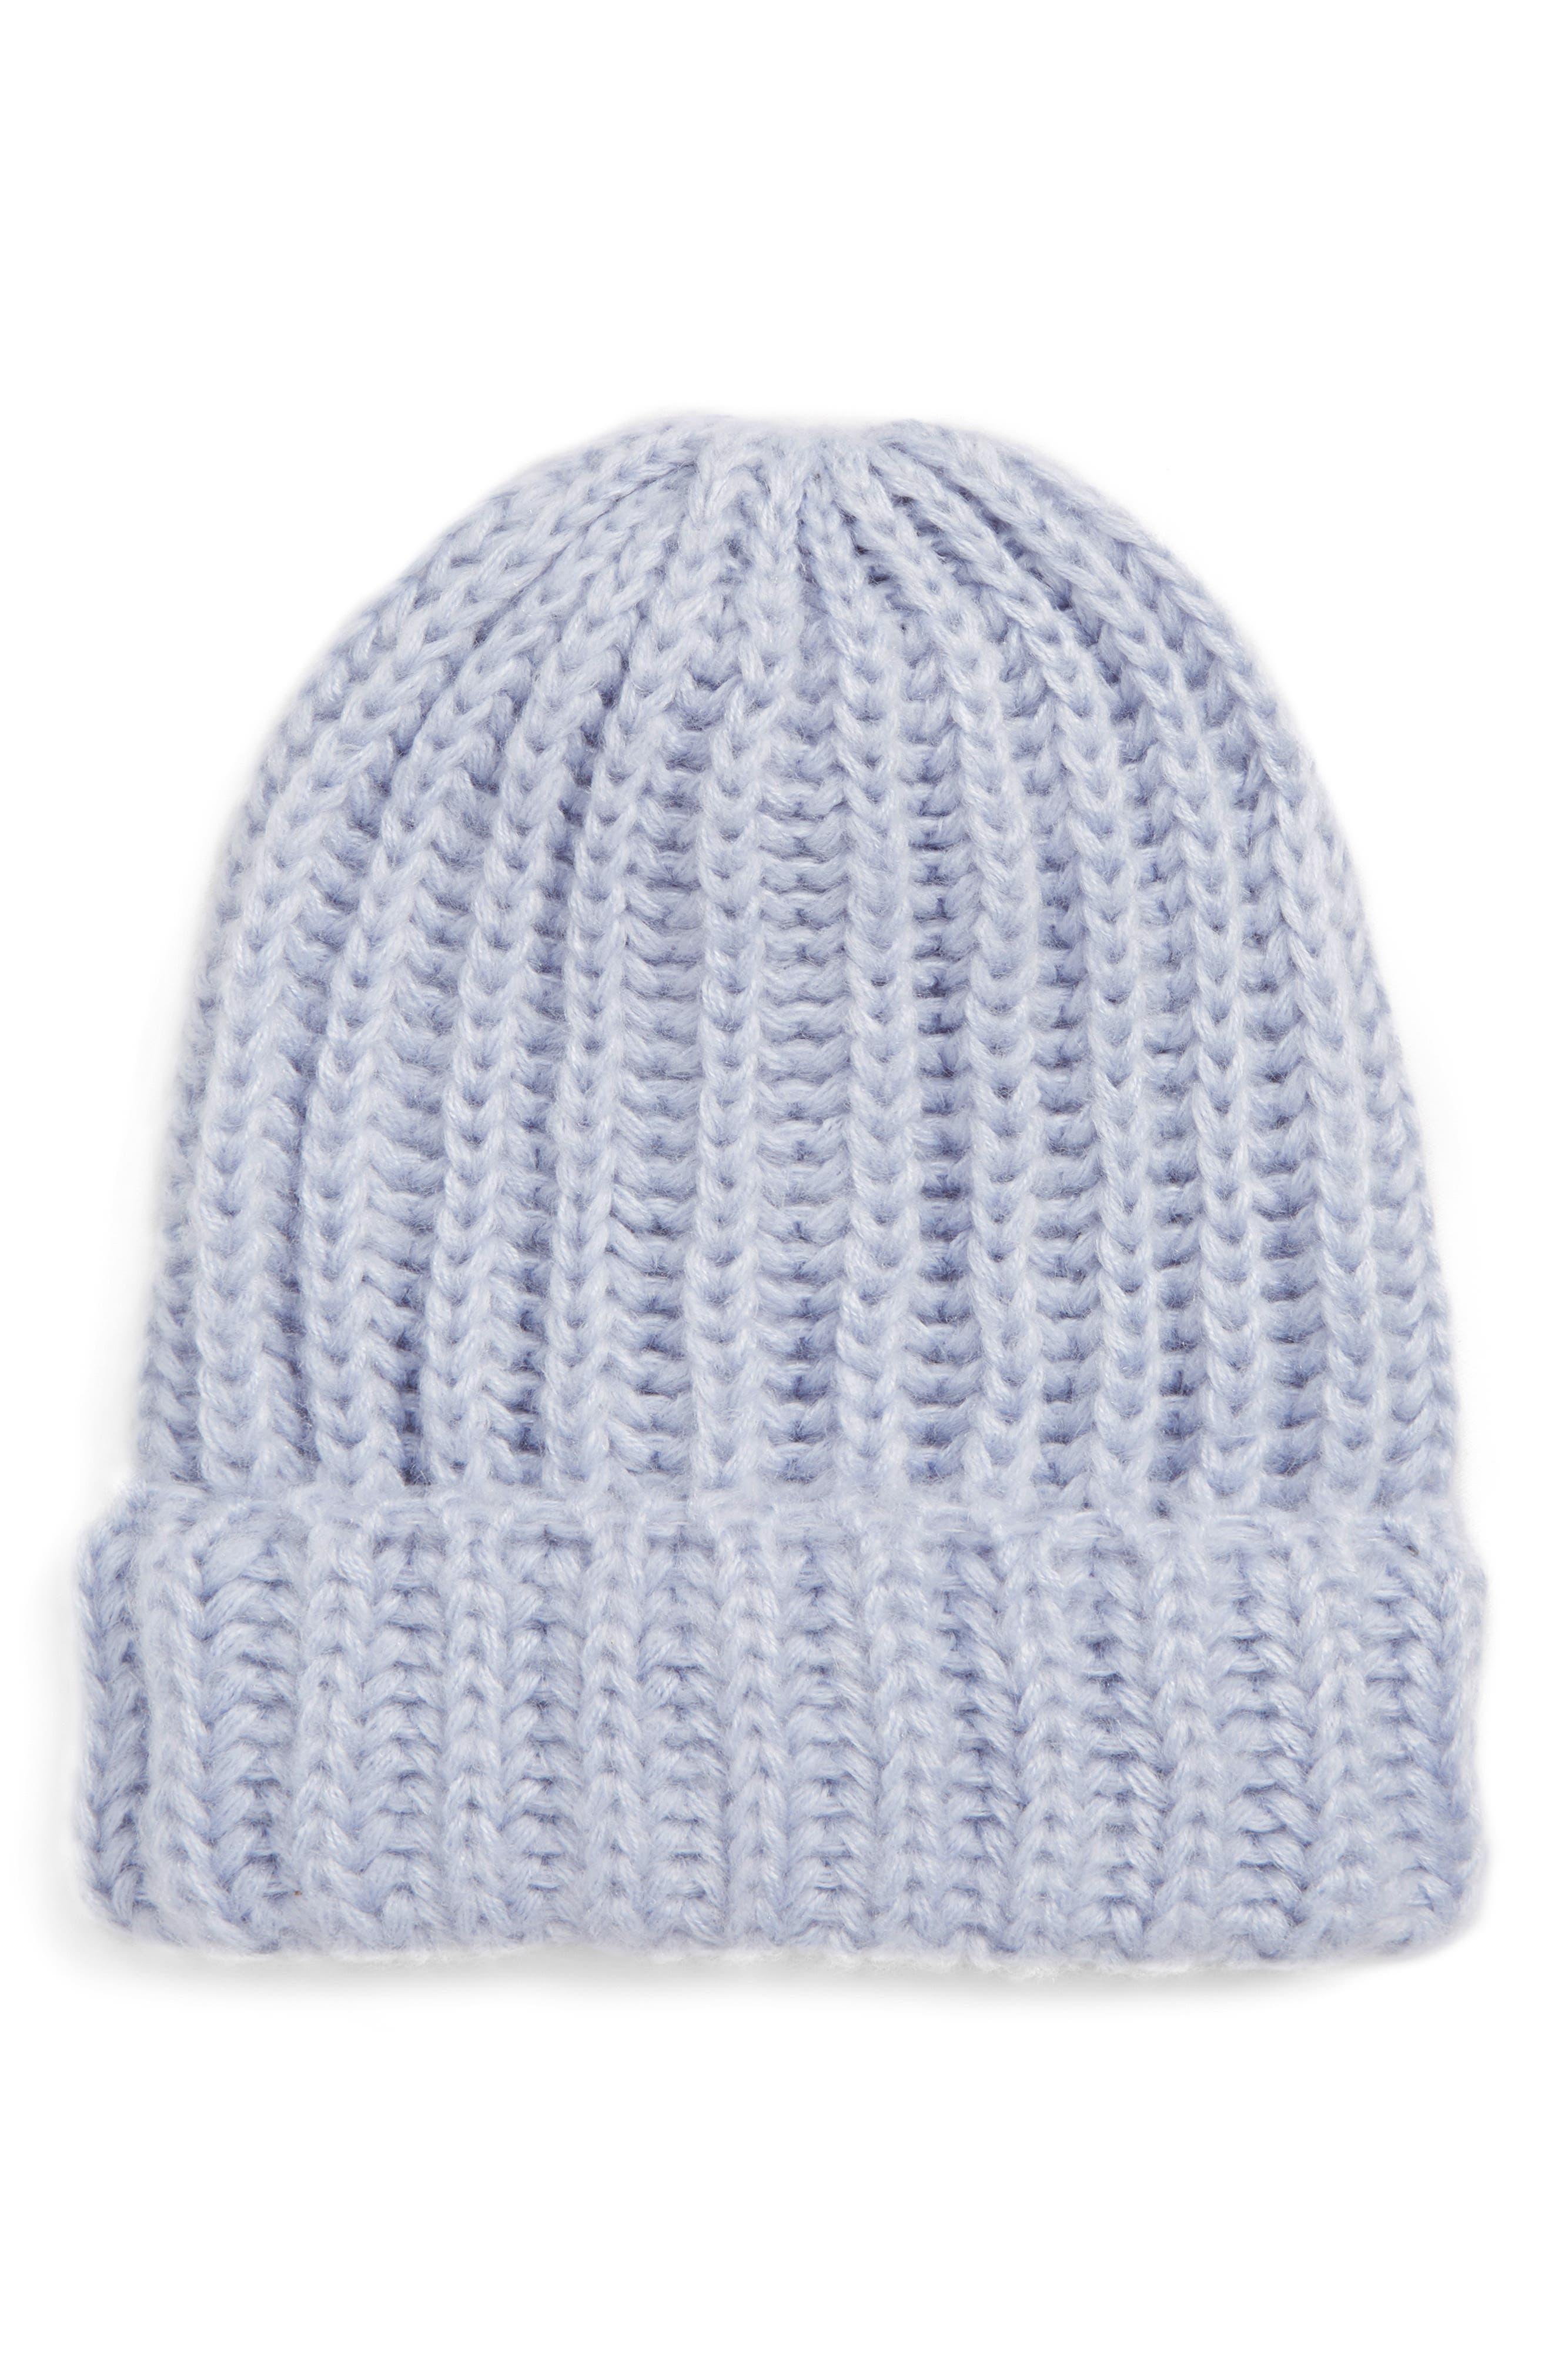 Fuzzy Knit Beanie,                             Main thumbnail 1, color,                             400